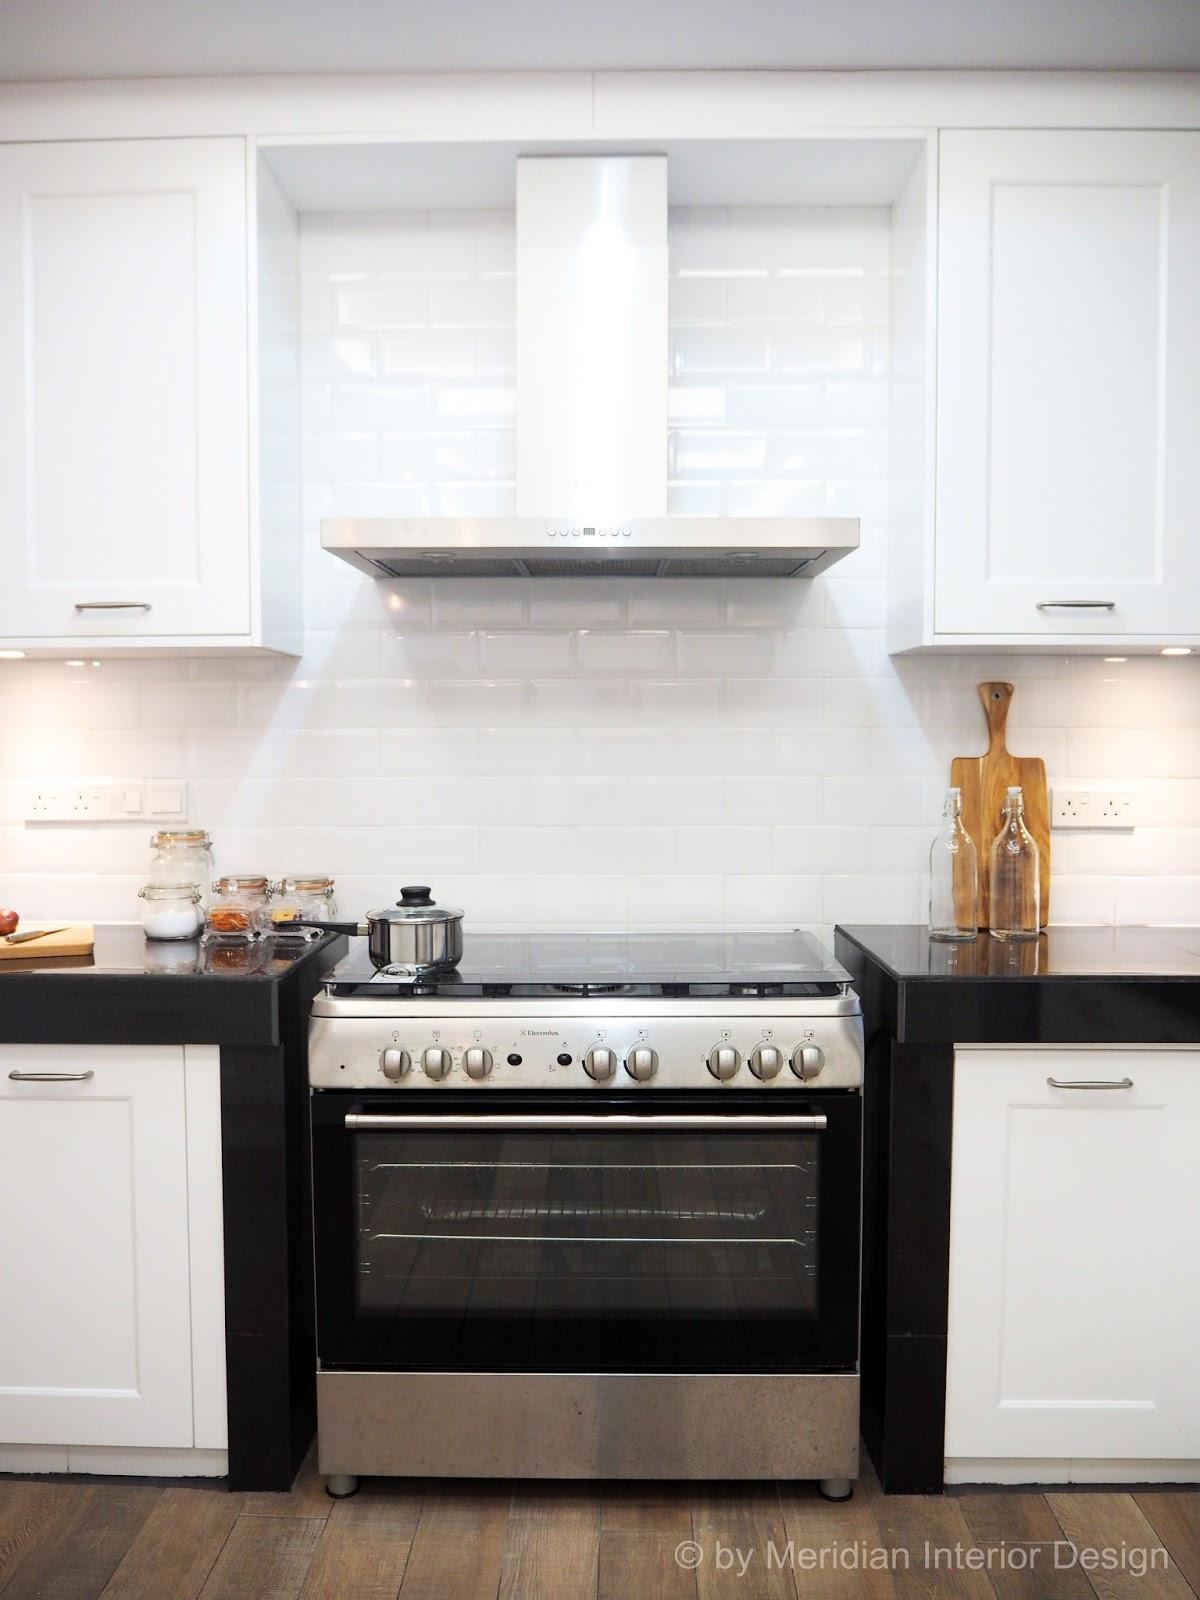 White glass kitchen island unit work top - Meridian Interior Design And Kitchen Design In Kuala